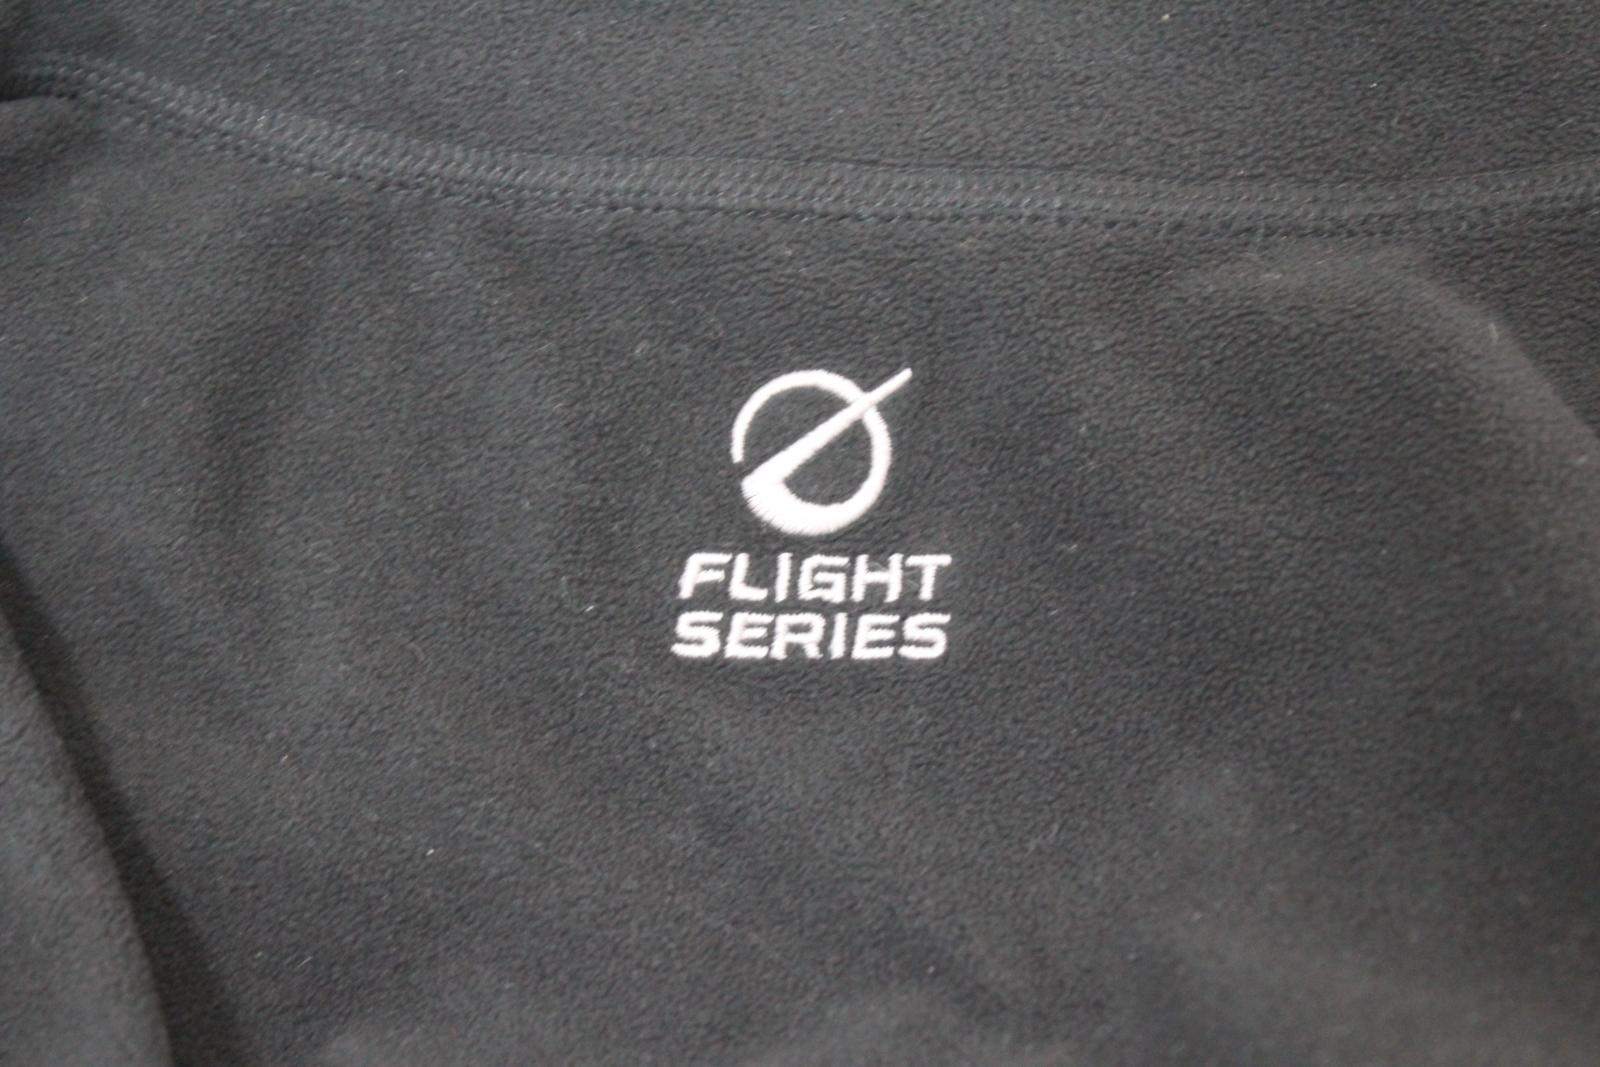 The-North-Face-vuelo-Series-Negro-para-Hombre-Polar-CHALECO-CHALECO-TAMANO-XXL-Cremallera miniatura 10